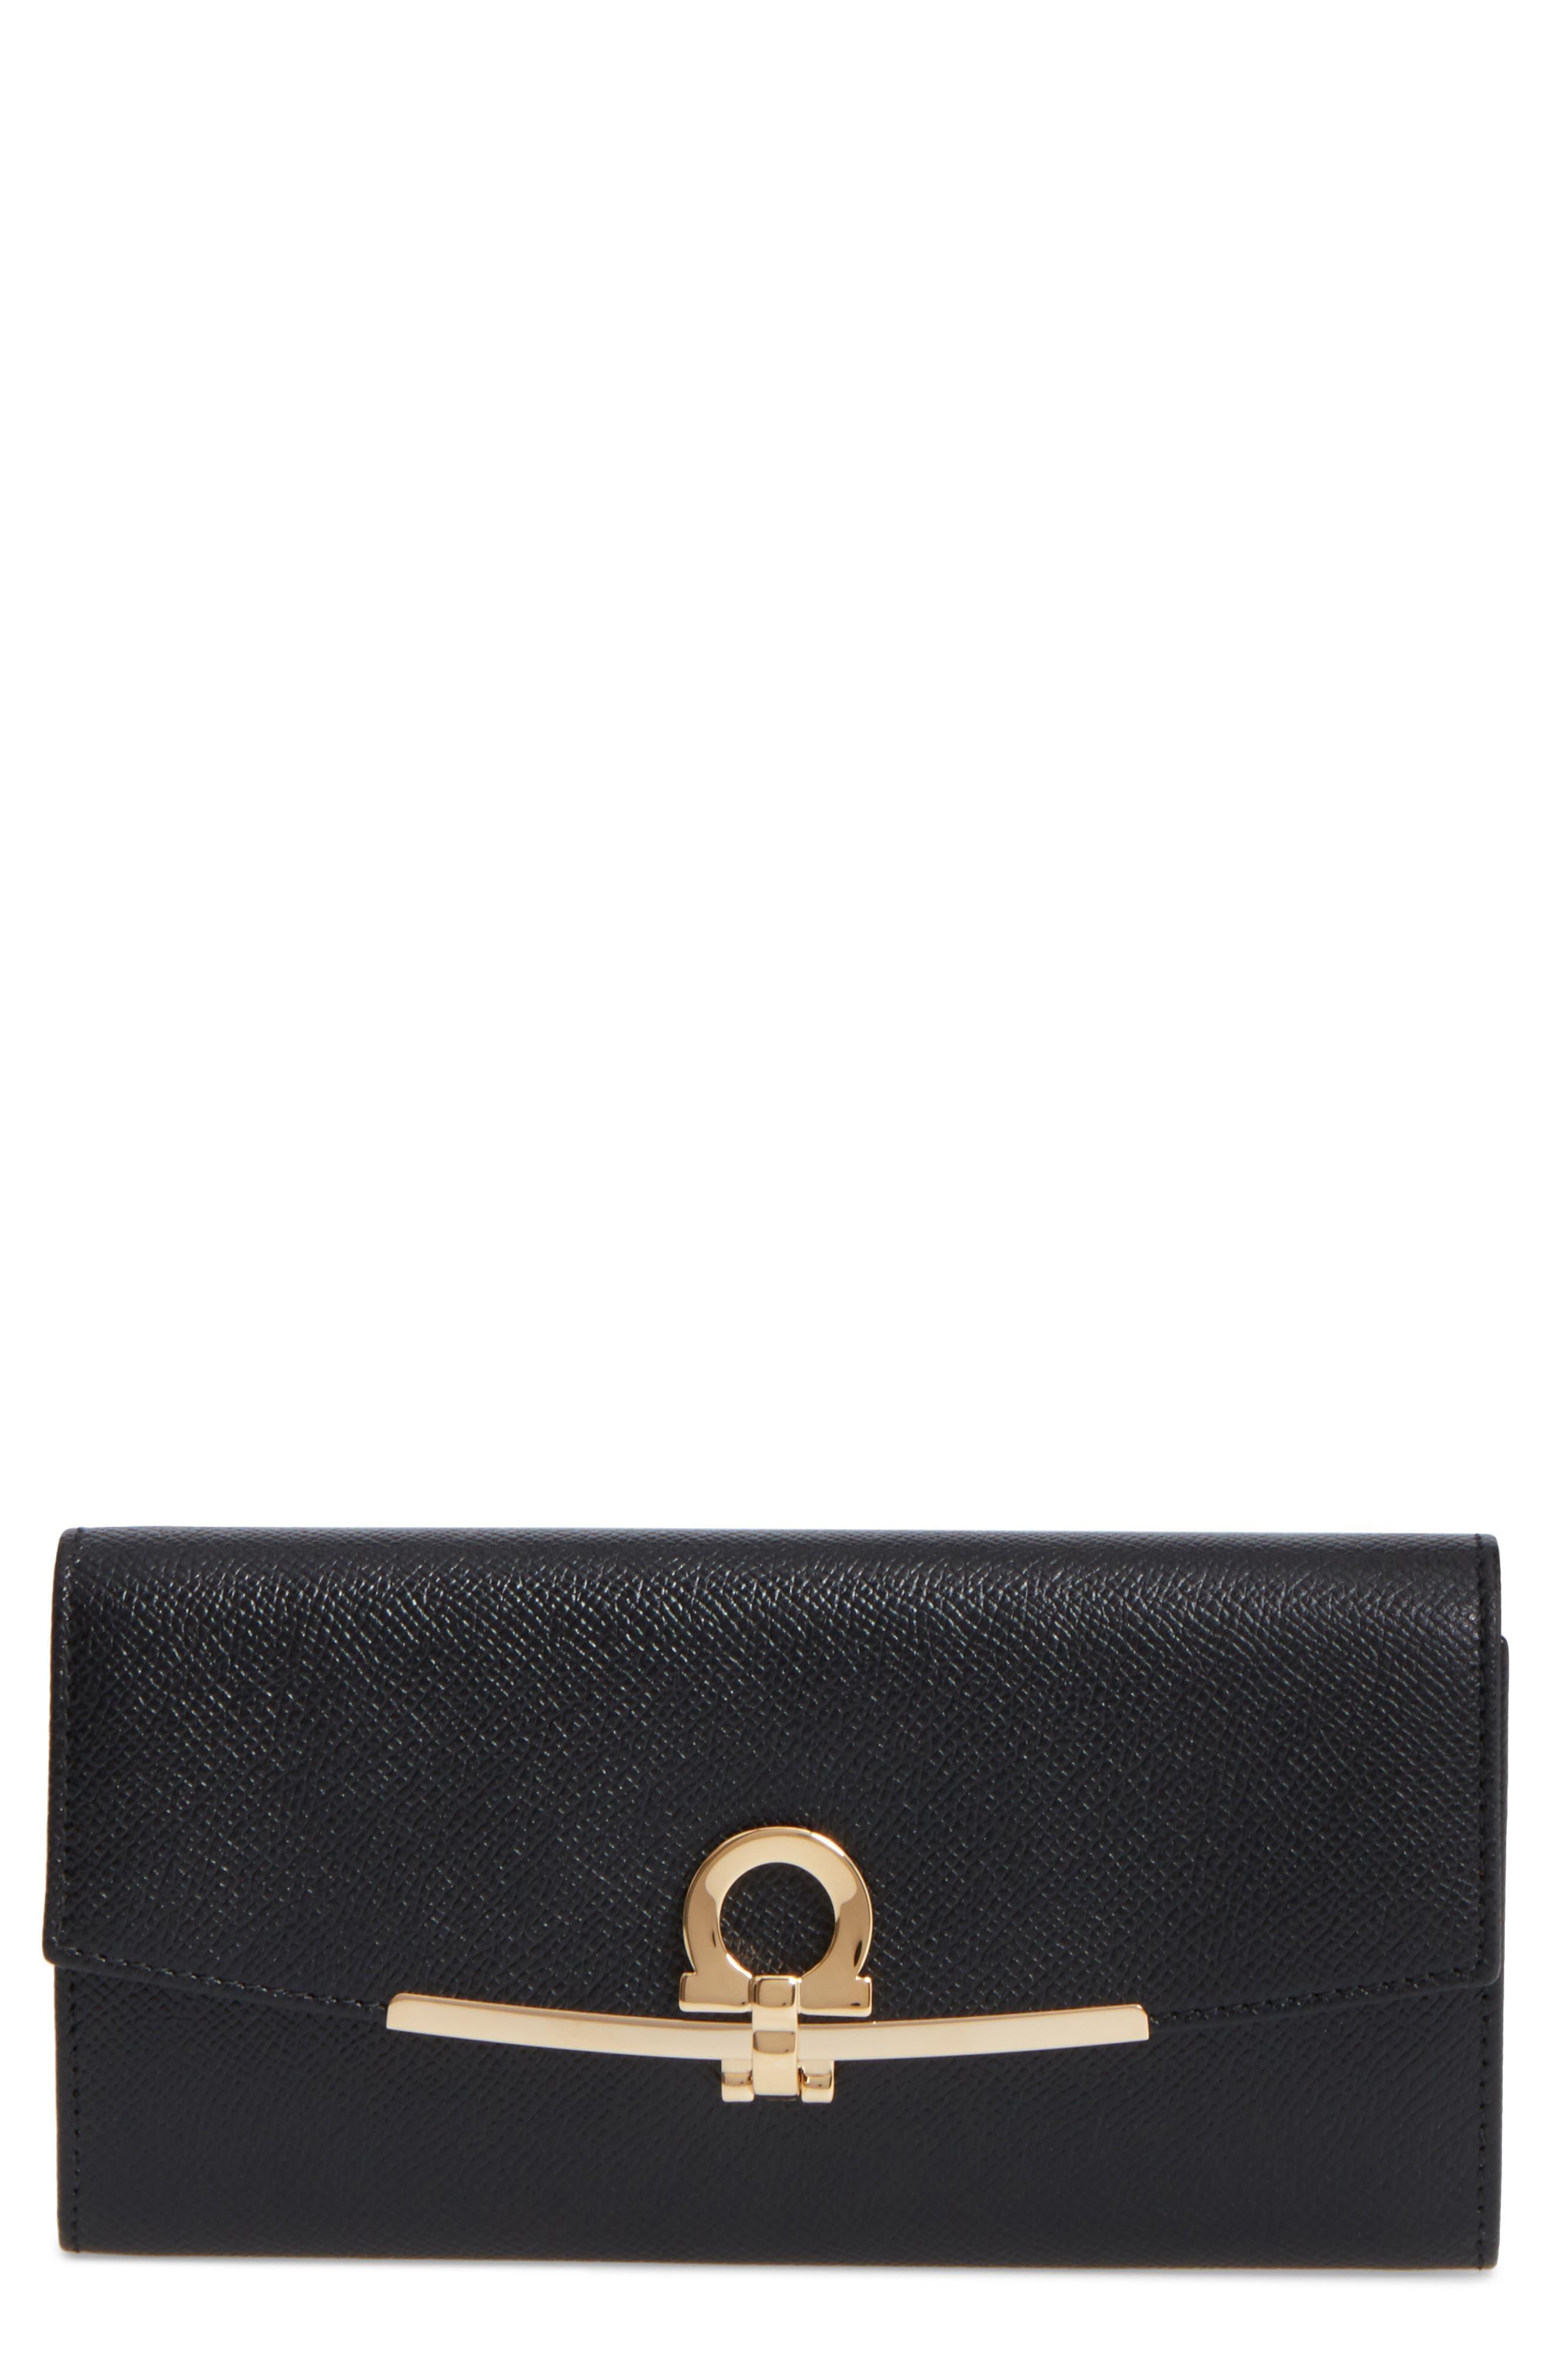 Bar Saffiano Calfskin Wallet,                         Main,                         color, Nero